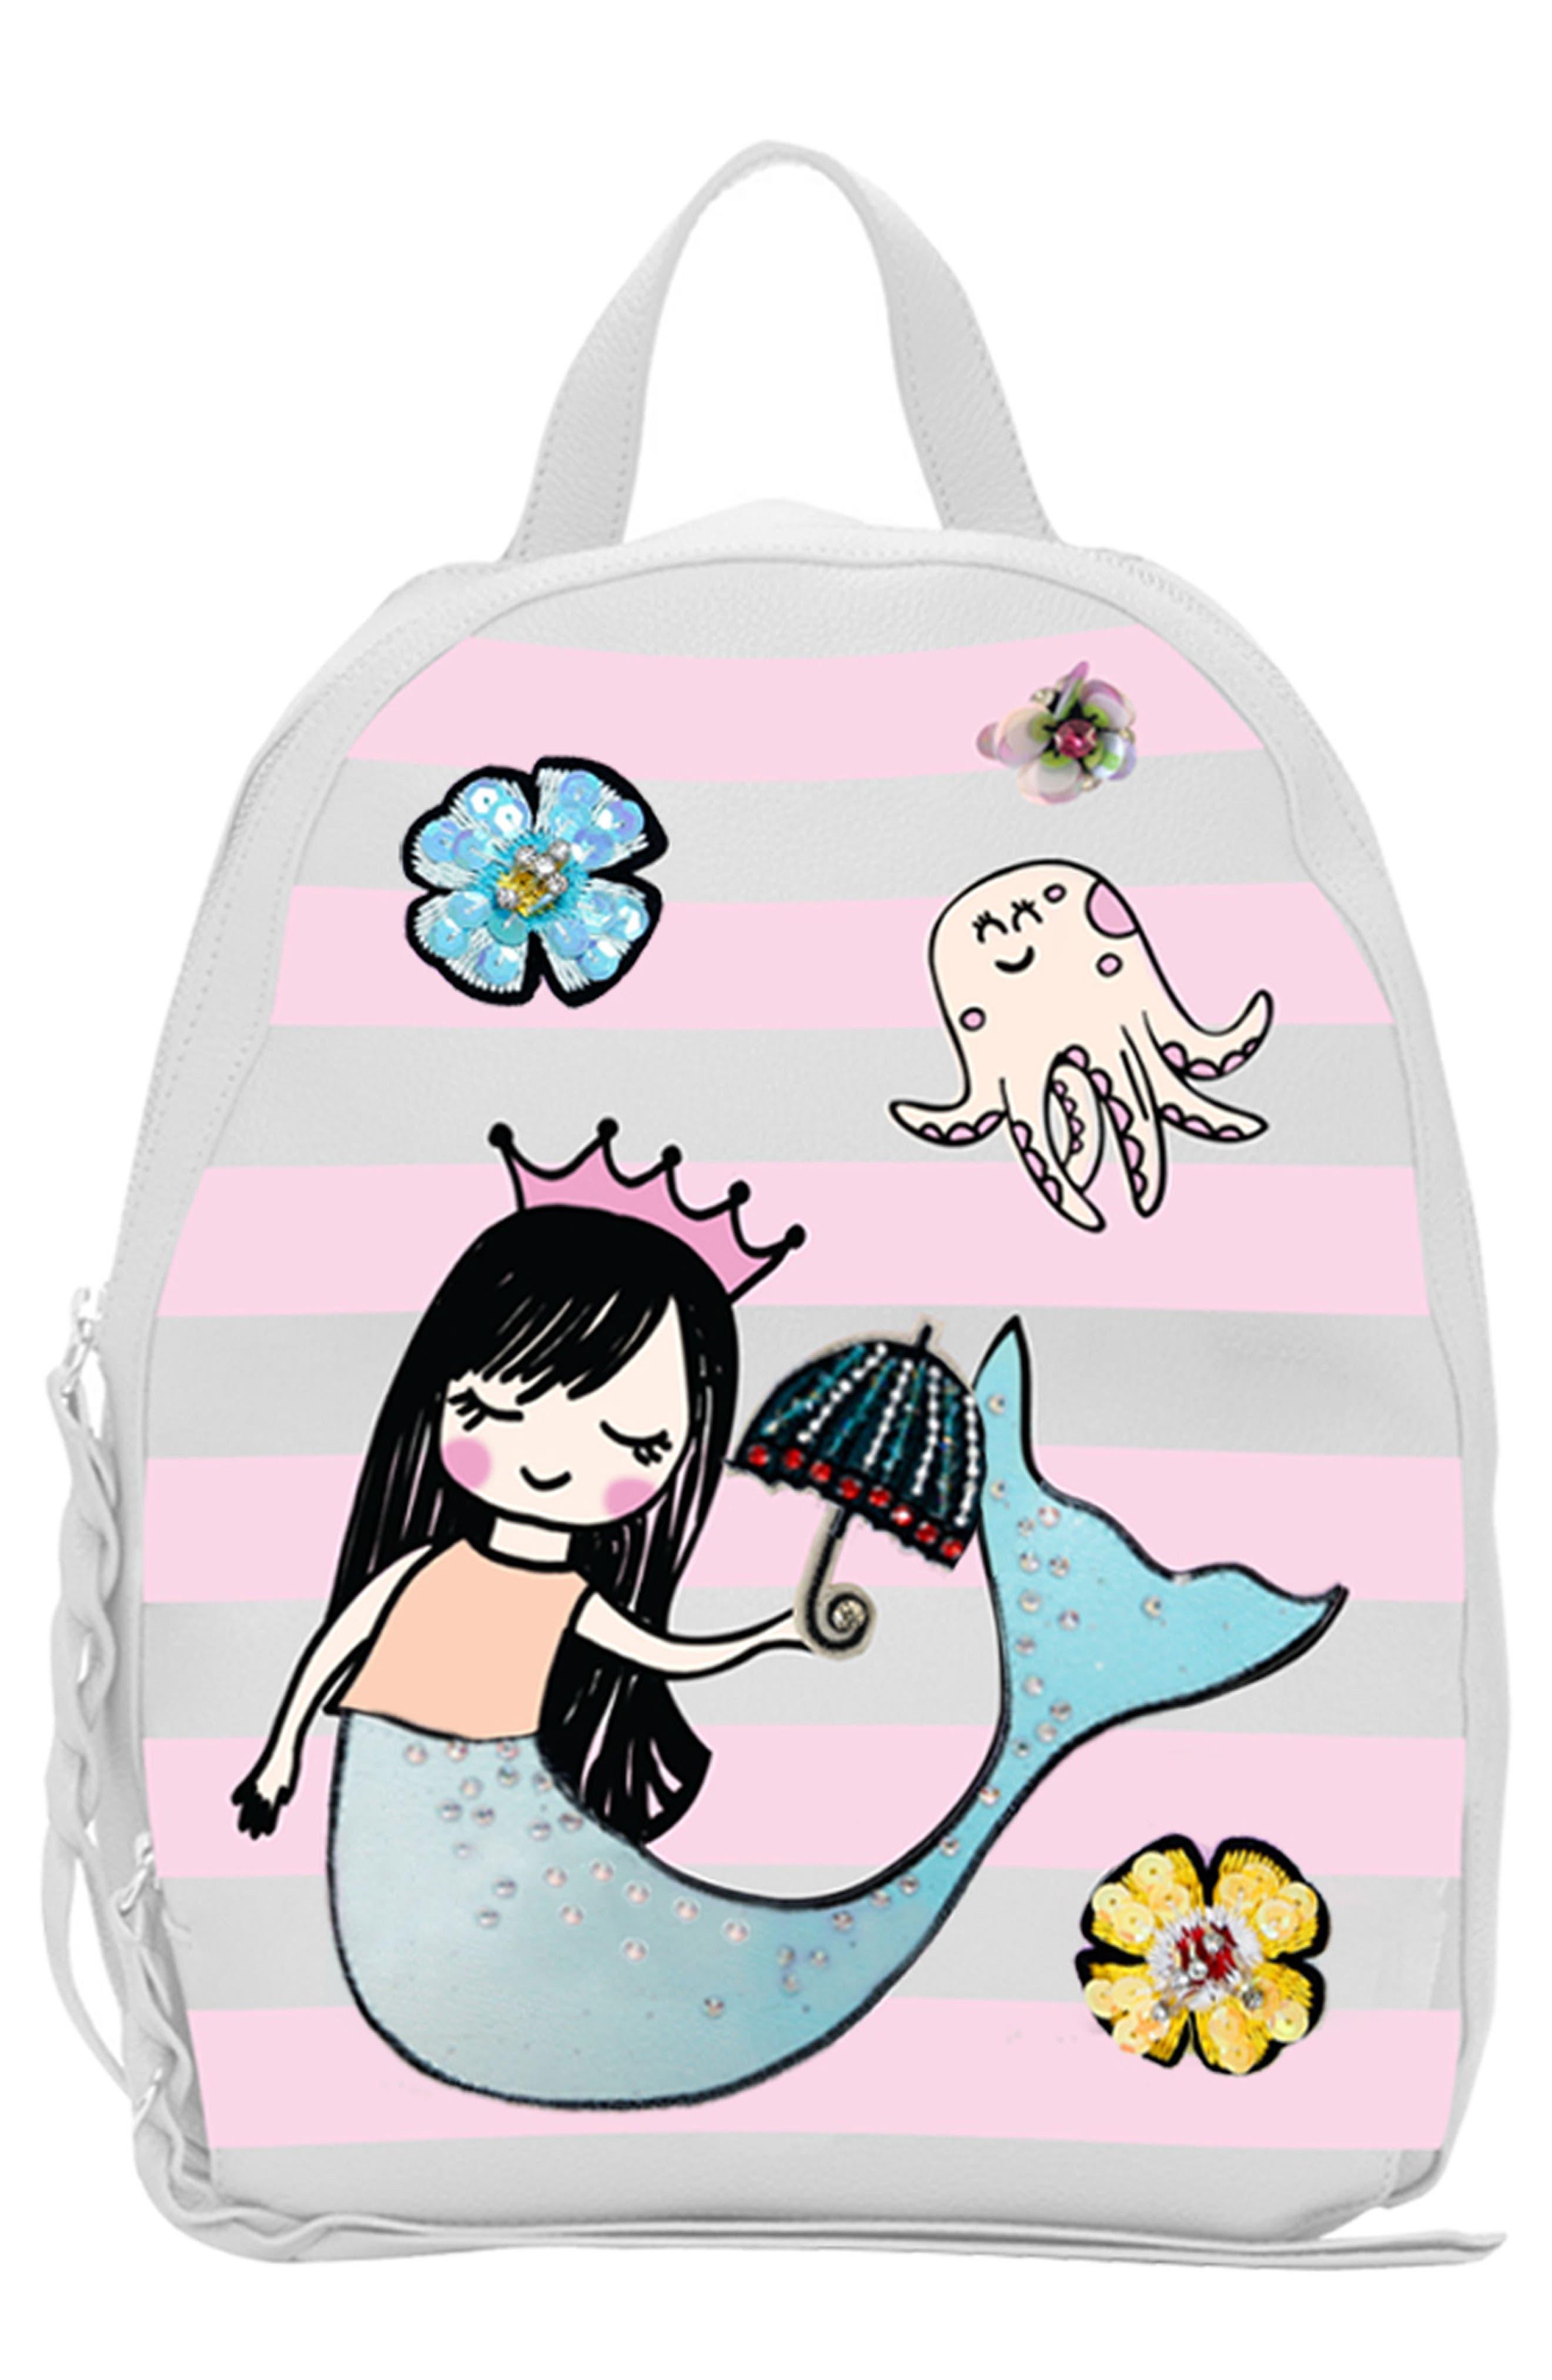 Embellished Mermaid Backpack,                             Main thumbnail 1, color,                             White